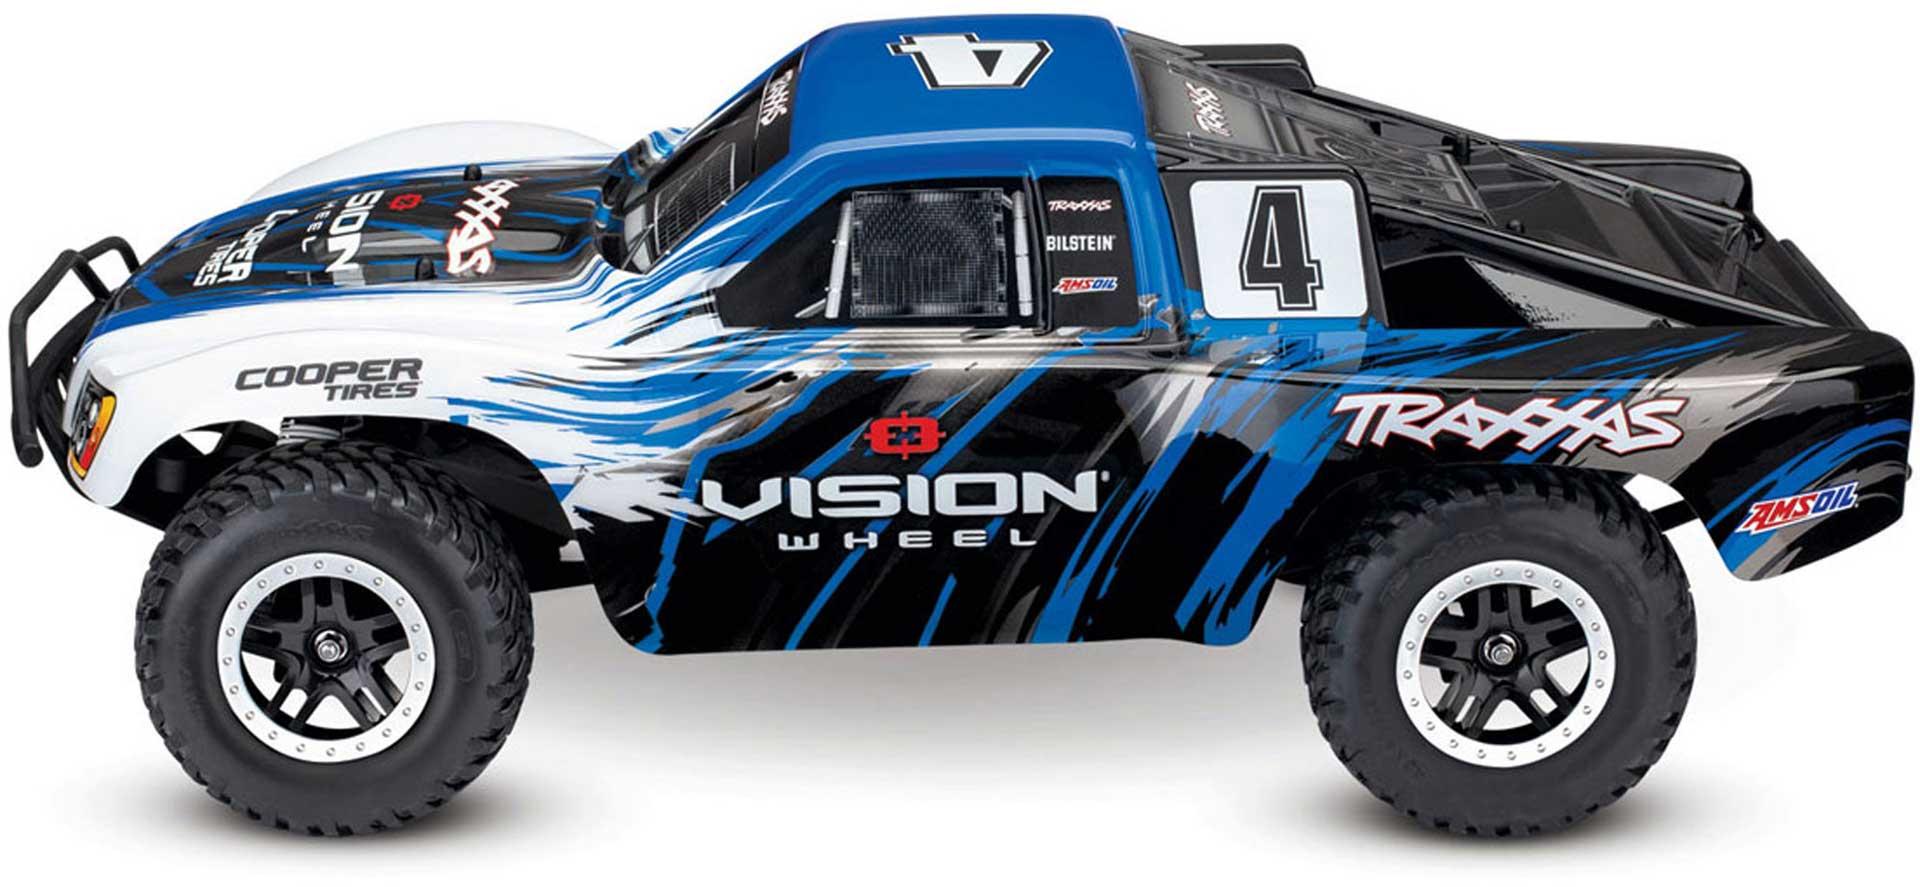 TRAXXAS SLASH 4X4 VXL VISION RTR 1/10 BRUSHLESS SHORT COURSE TRUCK BLUE/WHITE